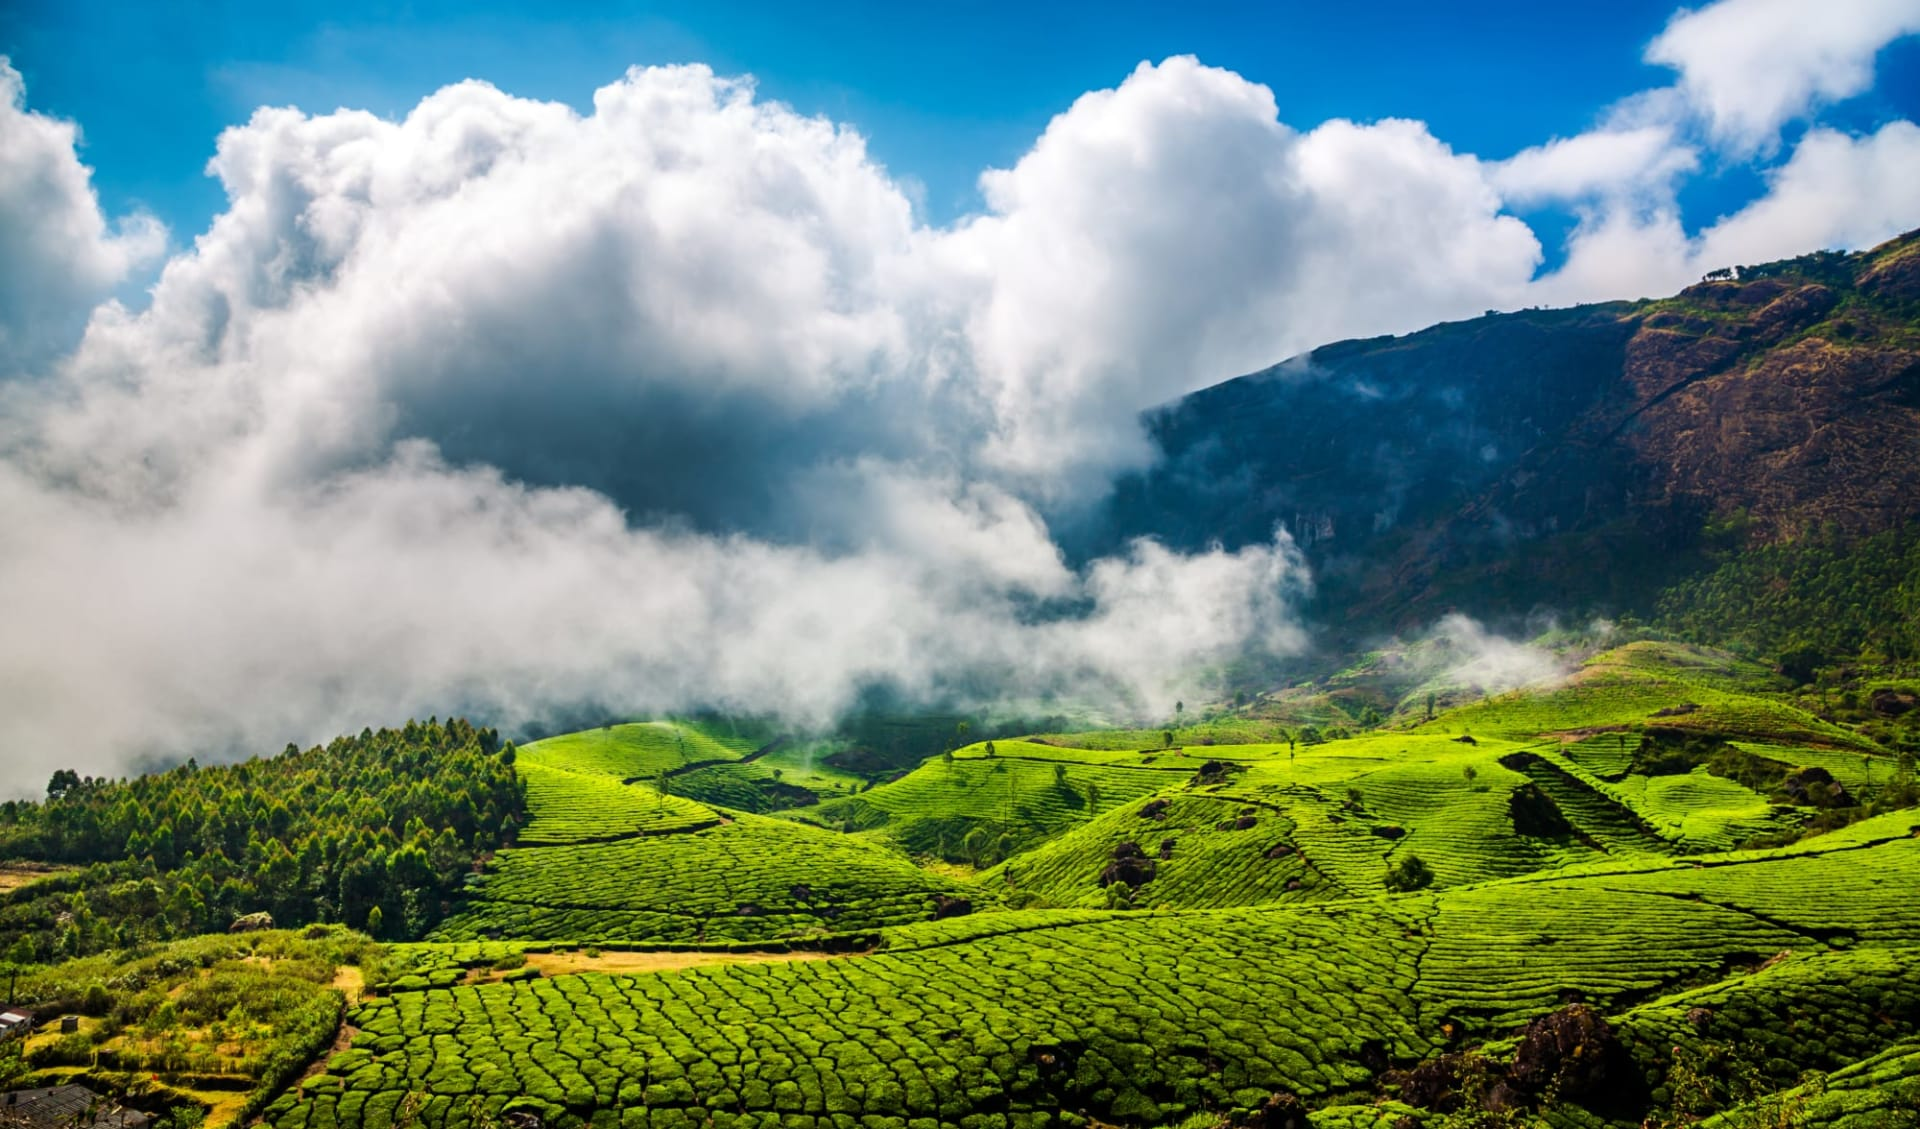 Naturschönheiten Keralas ab Kochi: Munnar Tea Plantation